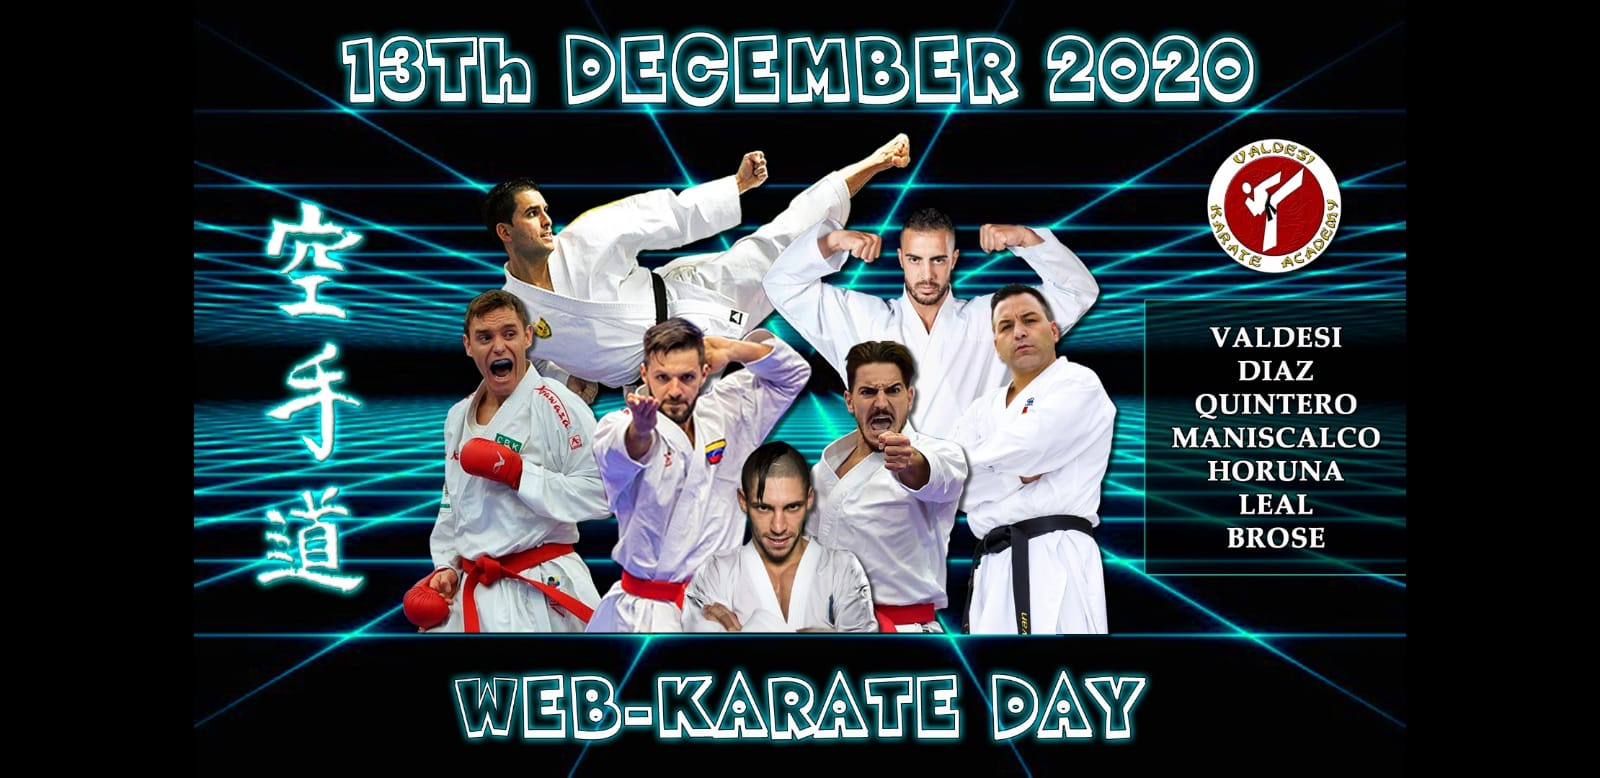 Web Karate Day - Session Kata - Quintero